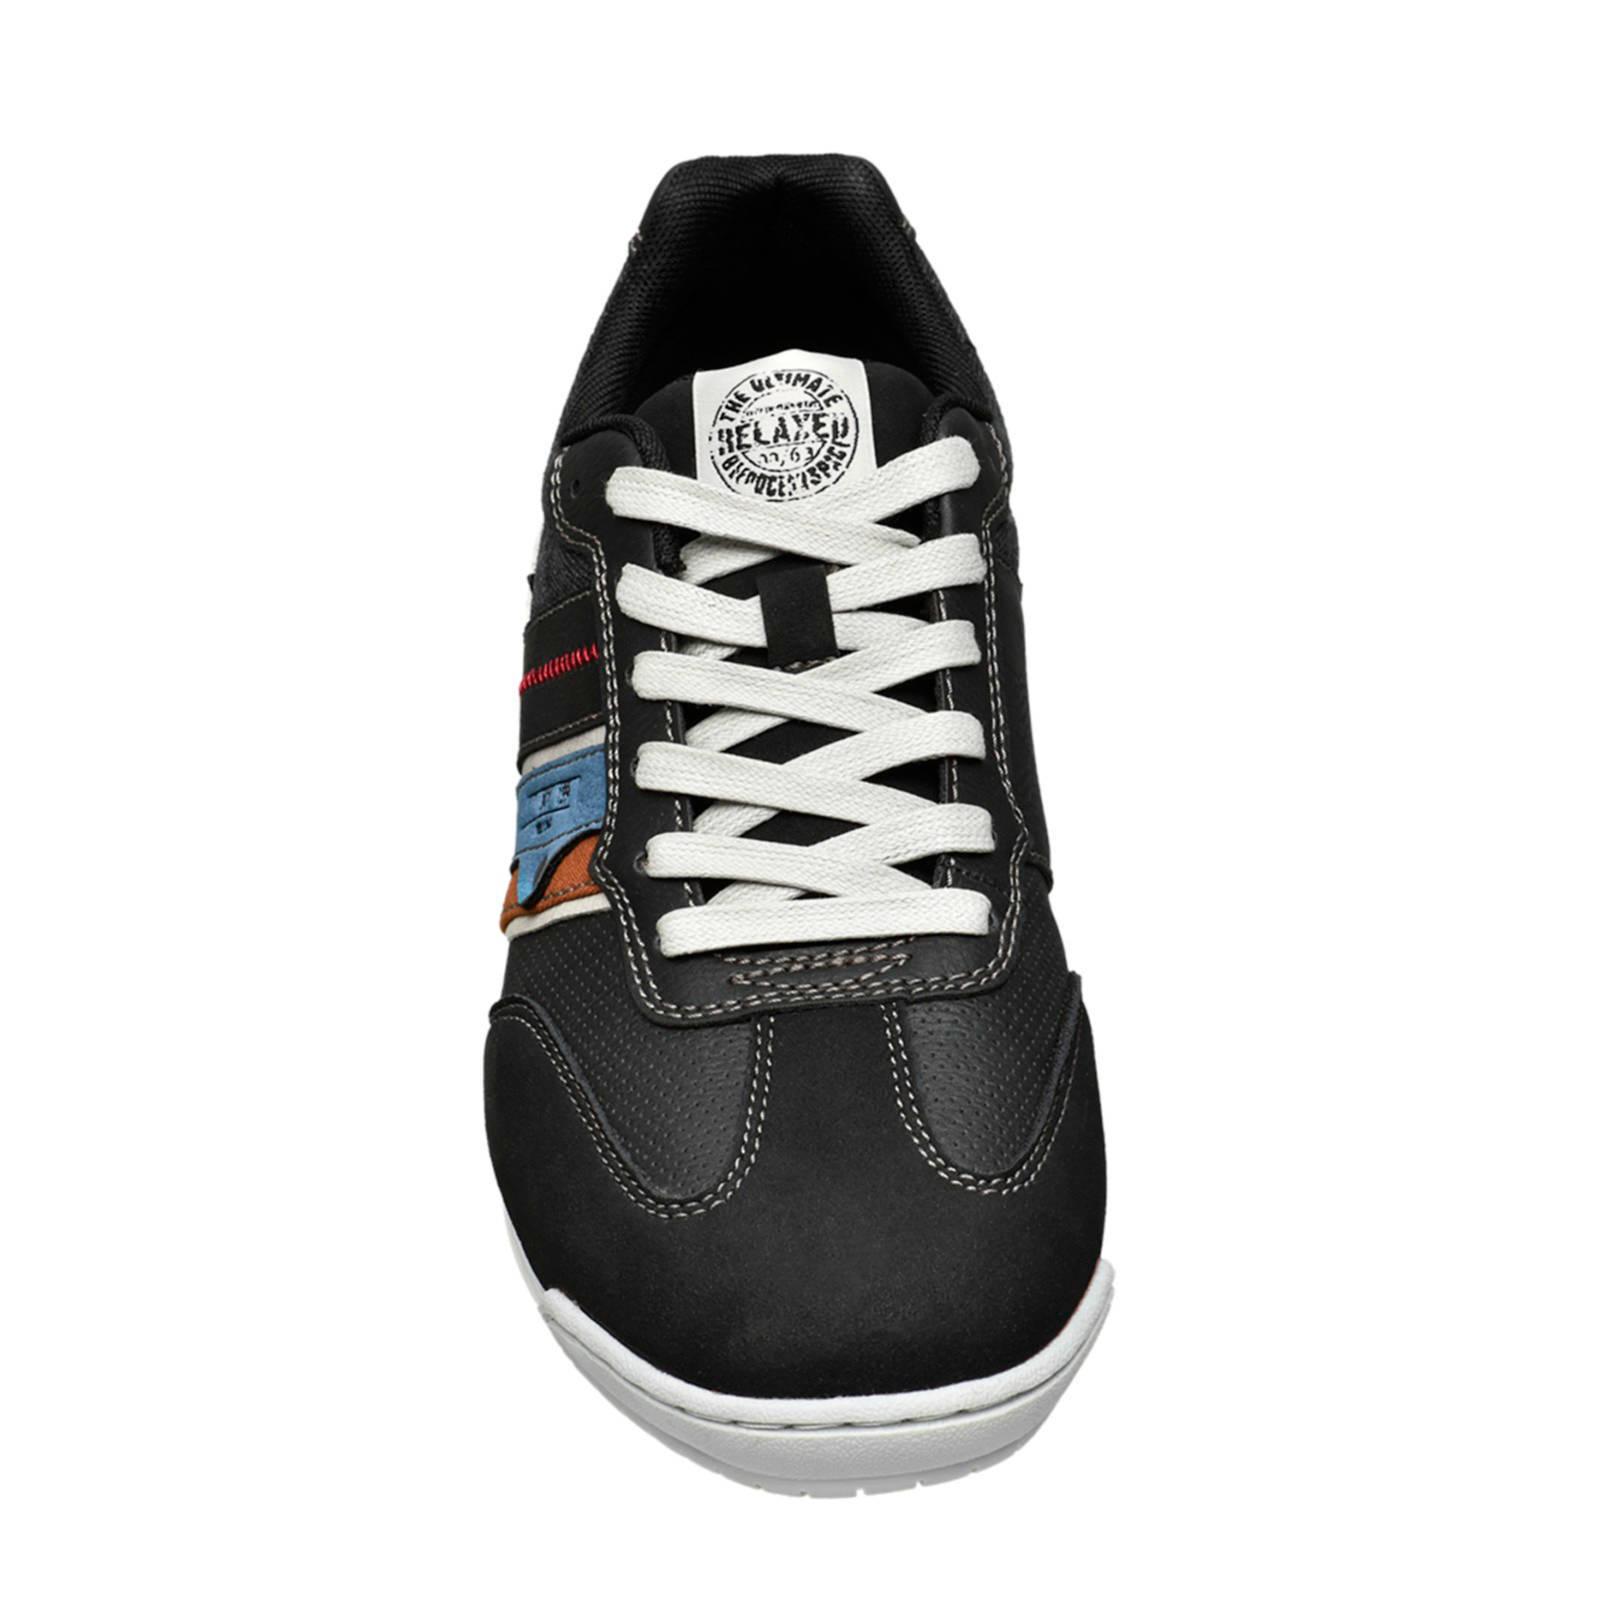 zwart One Memphis One sneakers Memphis sneakers sneakers One zwart Memphis zwart Memphis 0RTwgHfq